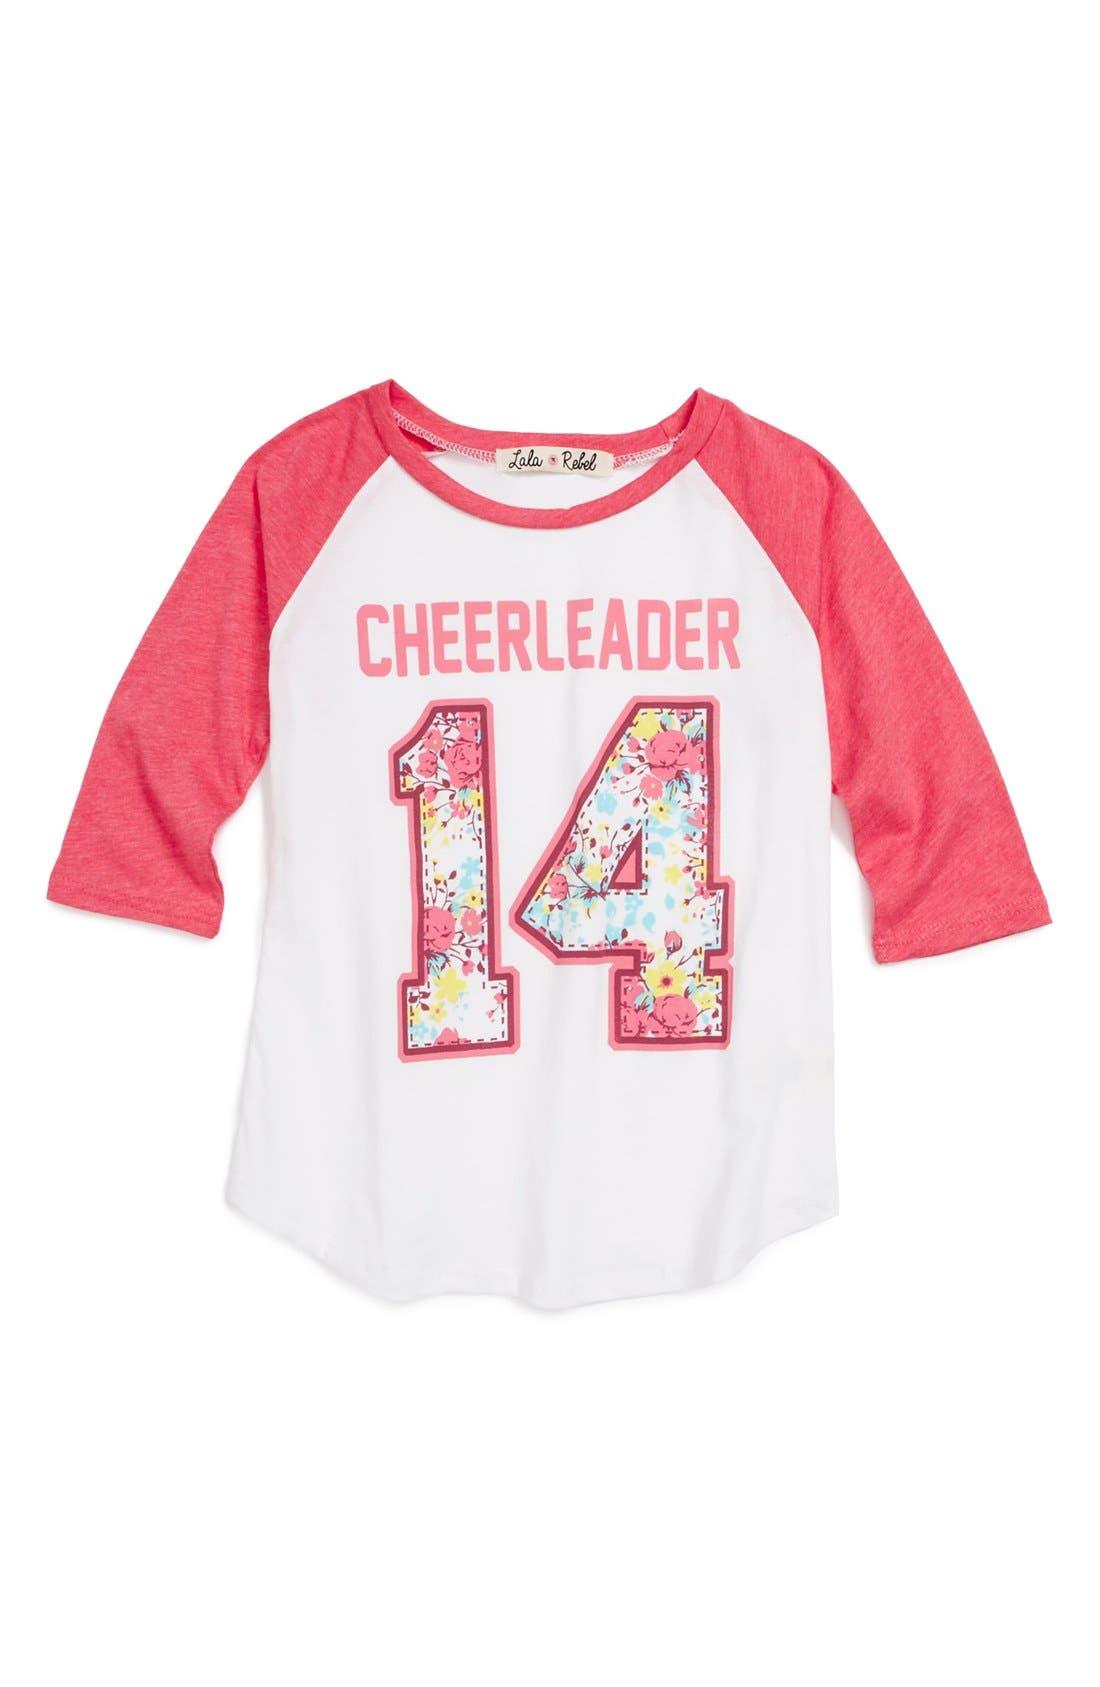 Main Image - Lala Rebel 'Cheerleader' Tee (Toddler Girls)